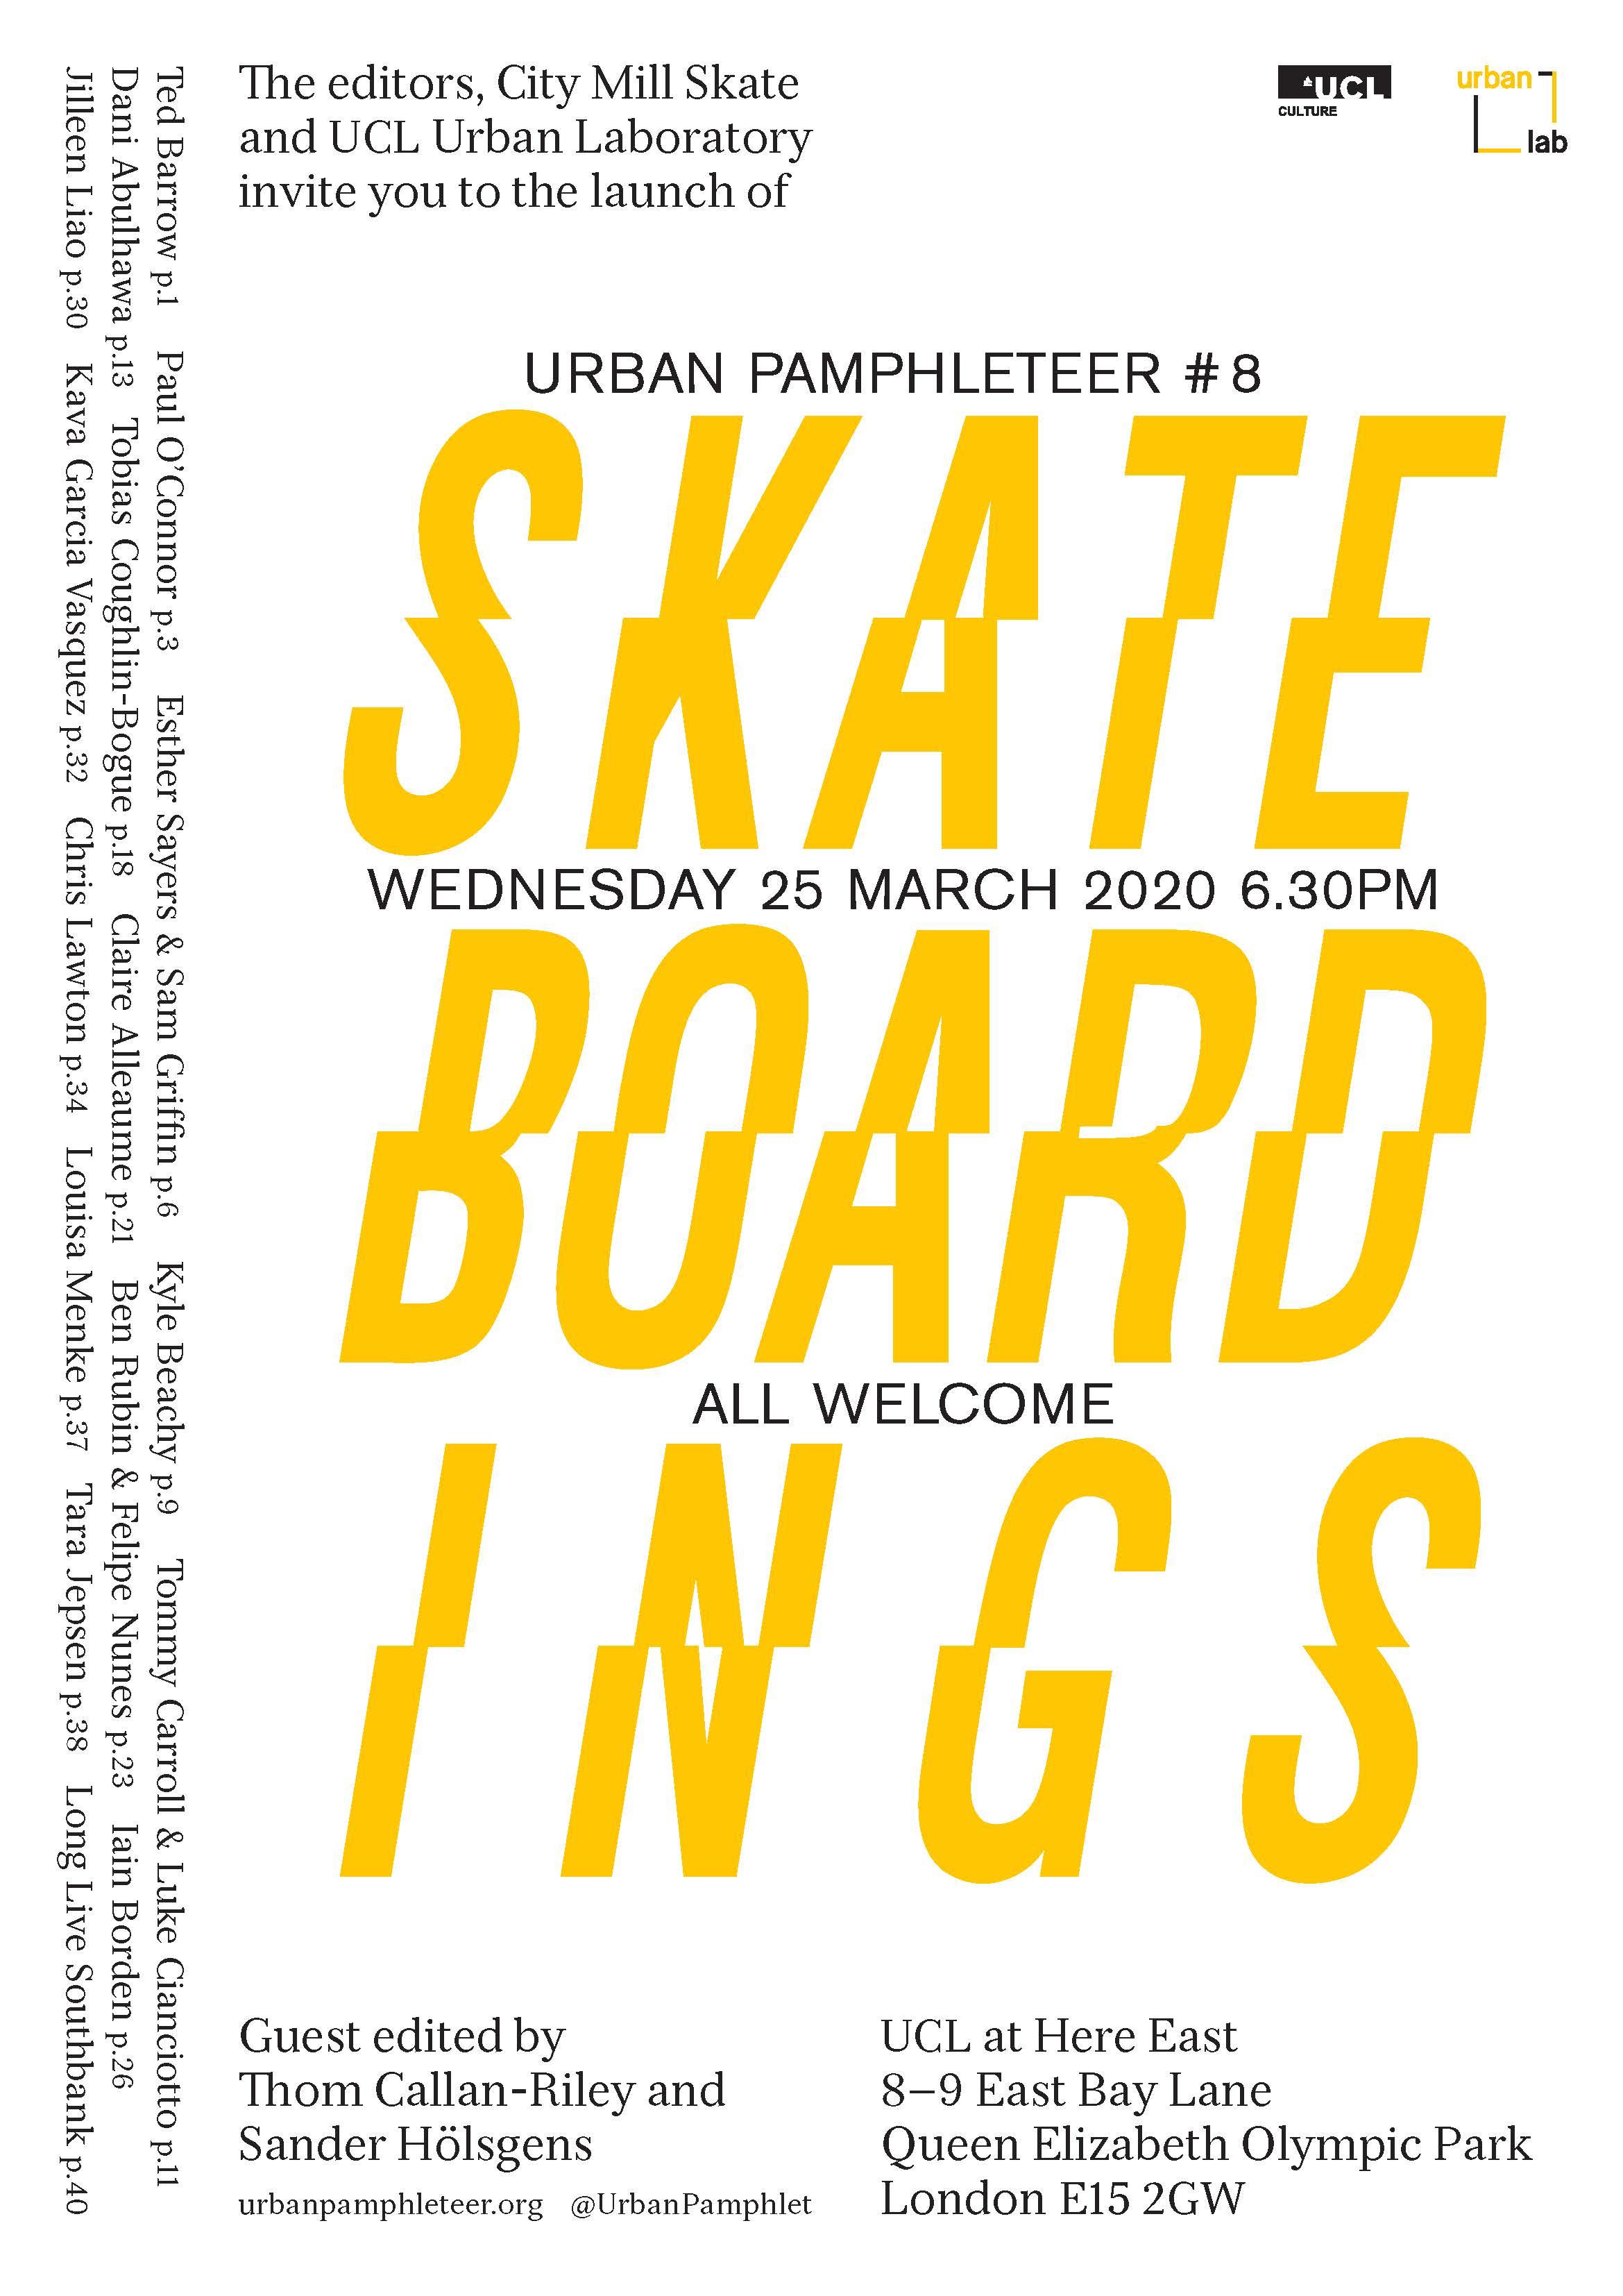 *POSTPONED* Urban Pamphleteer #8 launch: Skateboardings